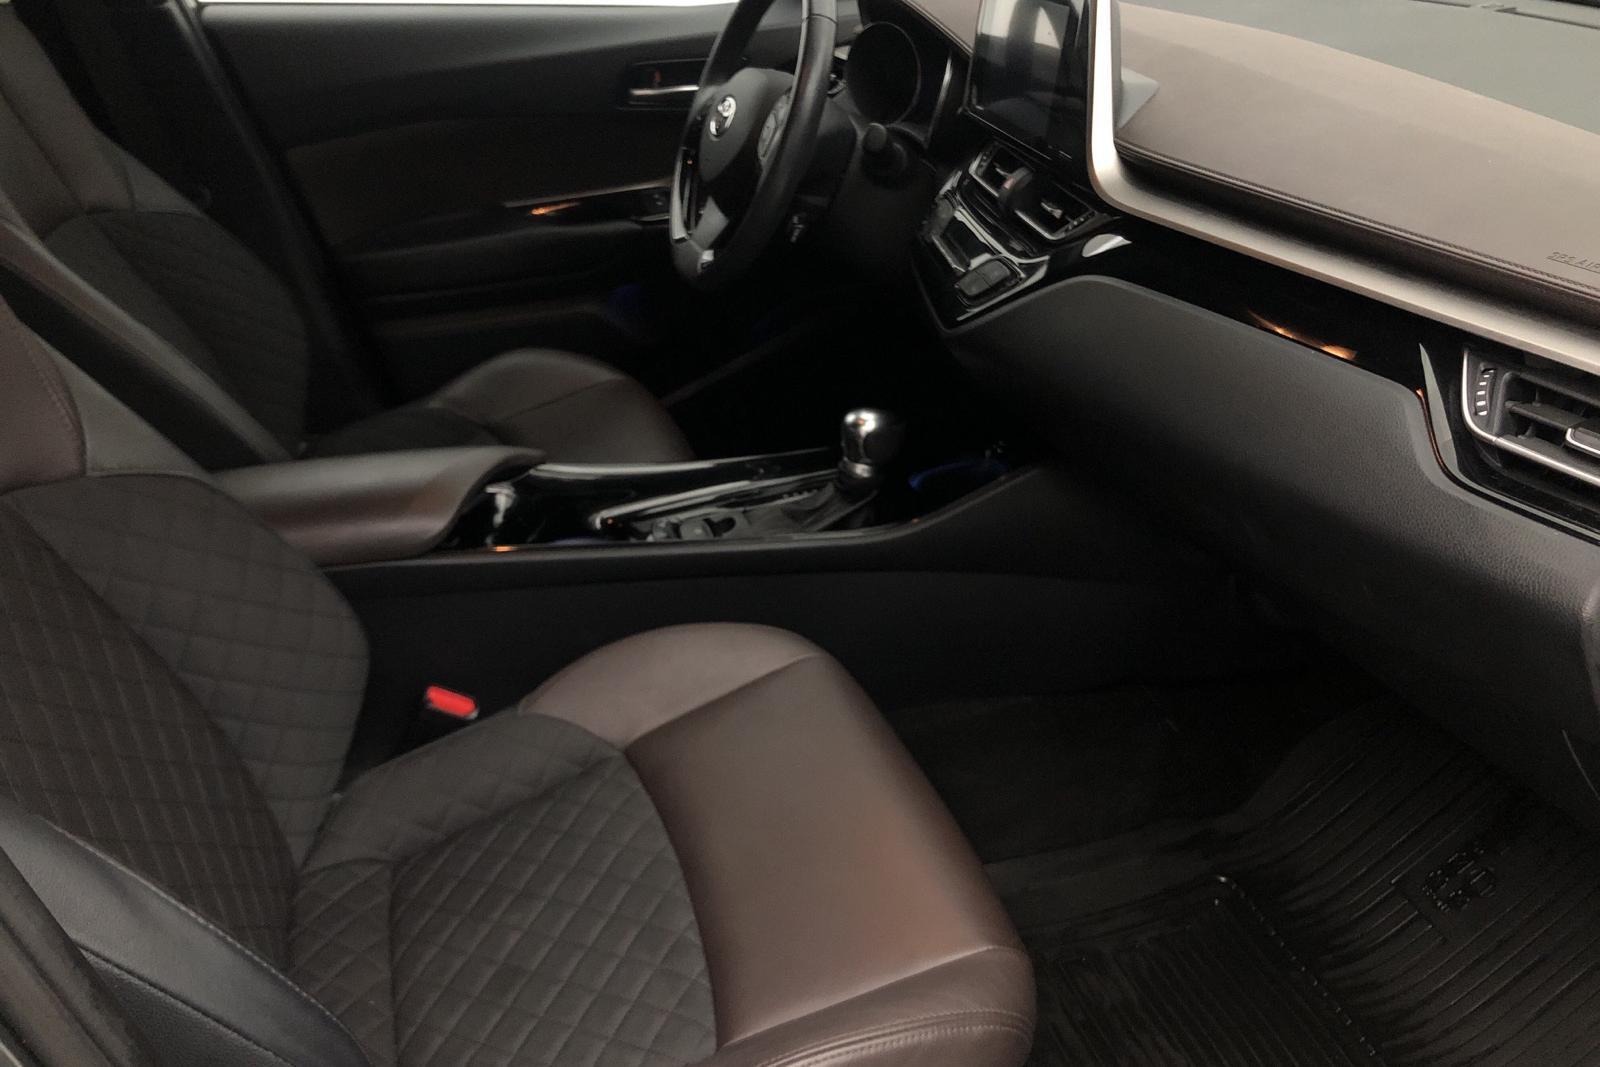 Toyota C-HR 1.8 HSD (122hk) - 72 000 km - Automatic - Dark Grey - 2017